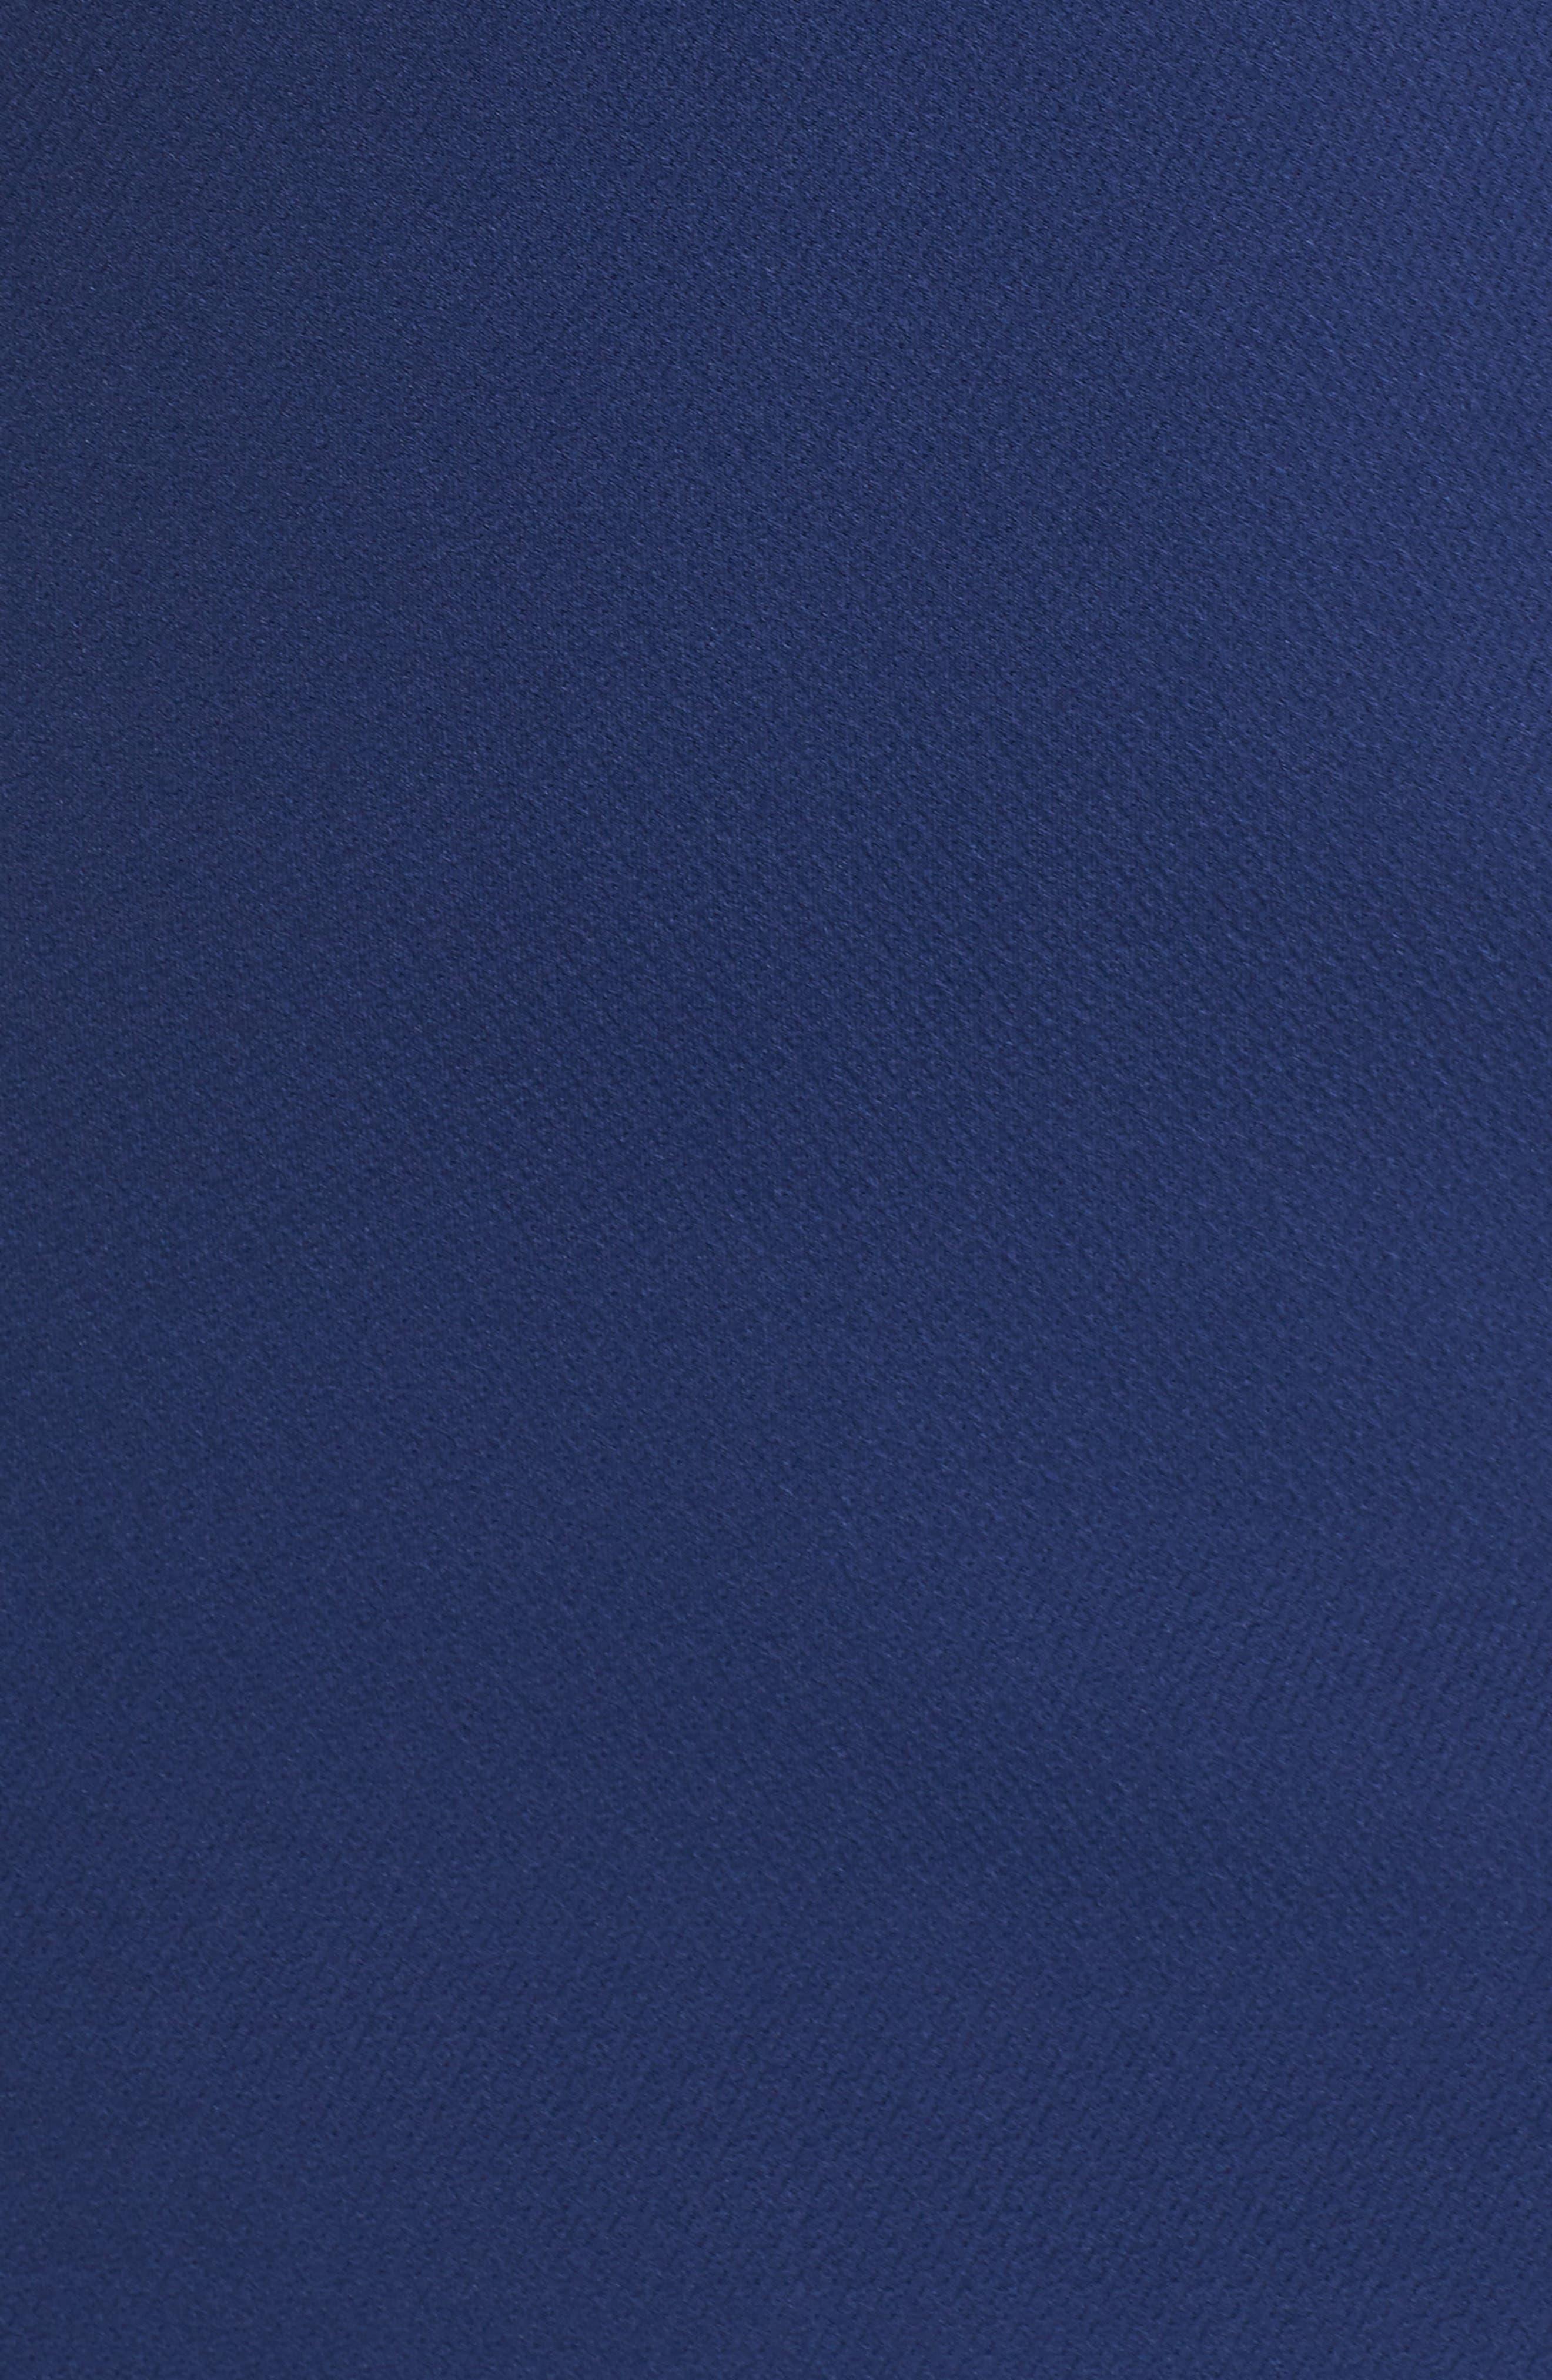 Evelyn Colorblock Sheath Dress,                             Alternate thumbnail 6, color,                             Multi